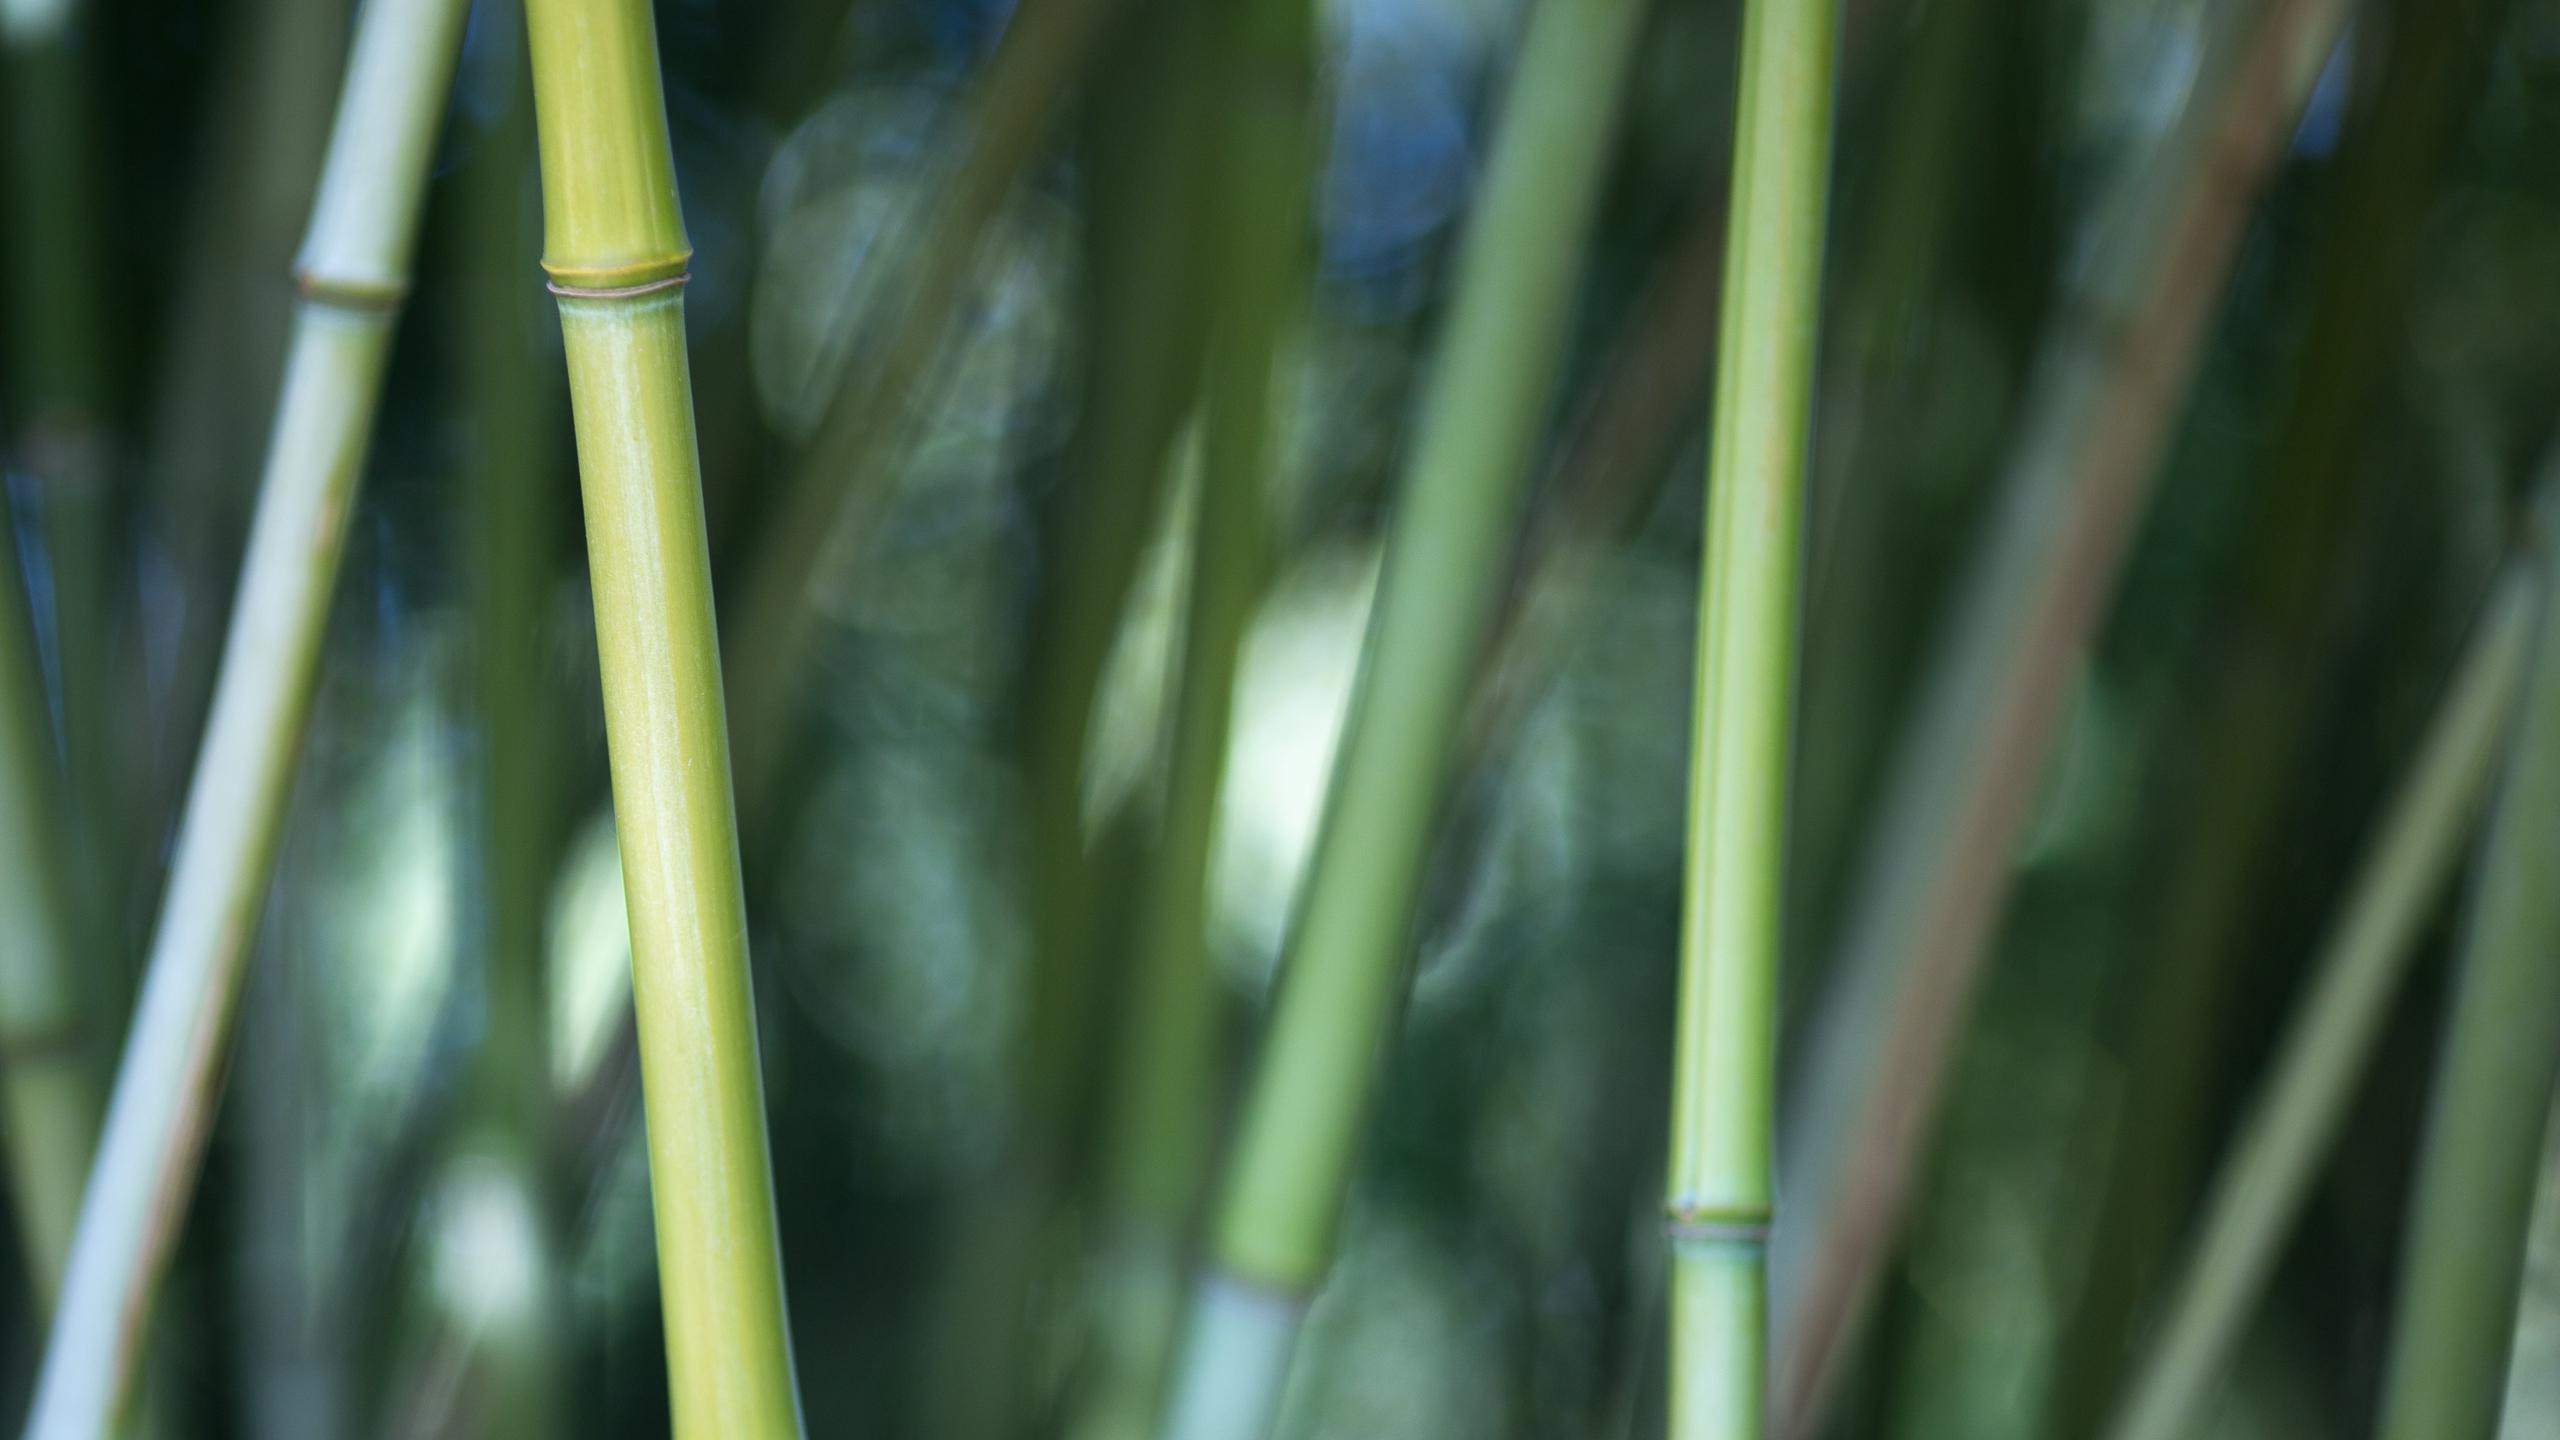 Nawak Bamboo Wallpaper by Pierre-Lagarde